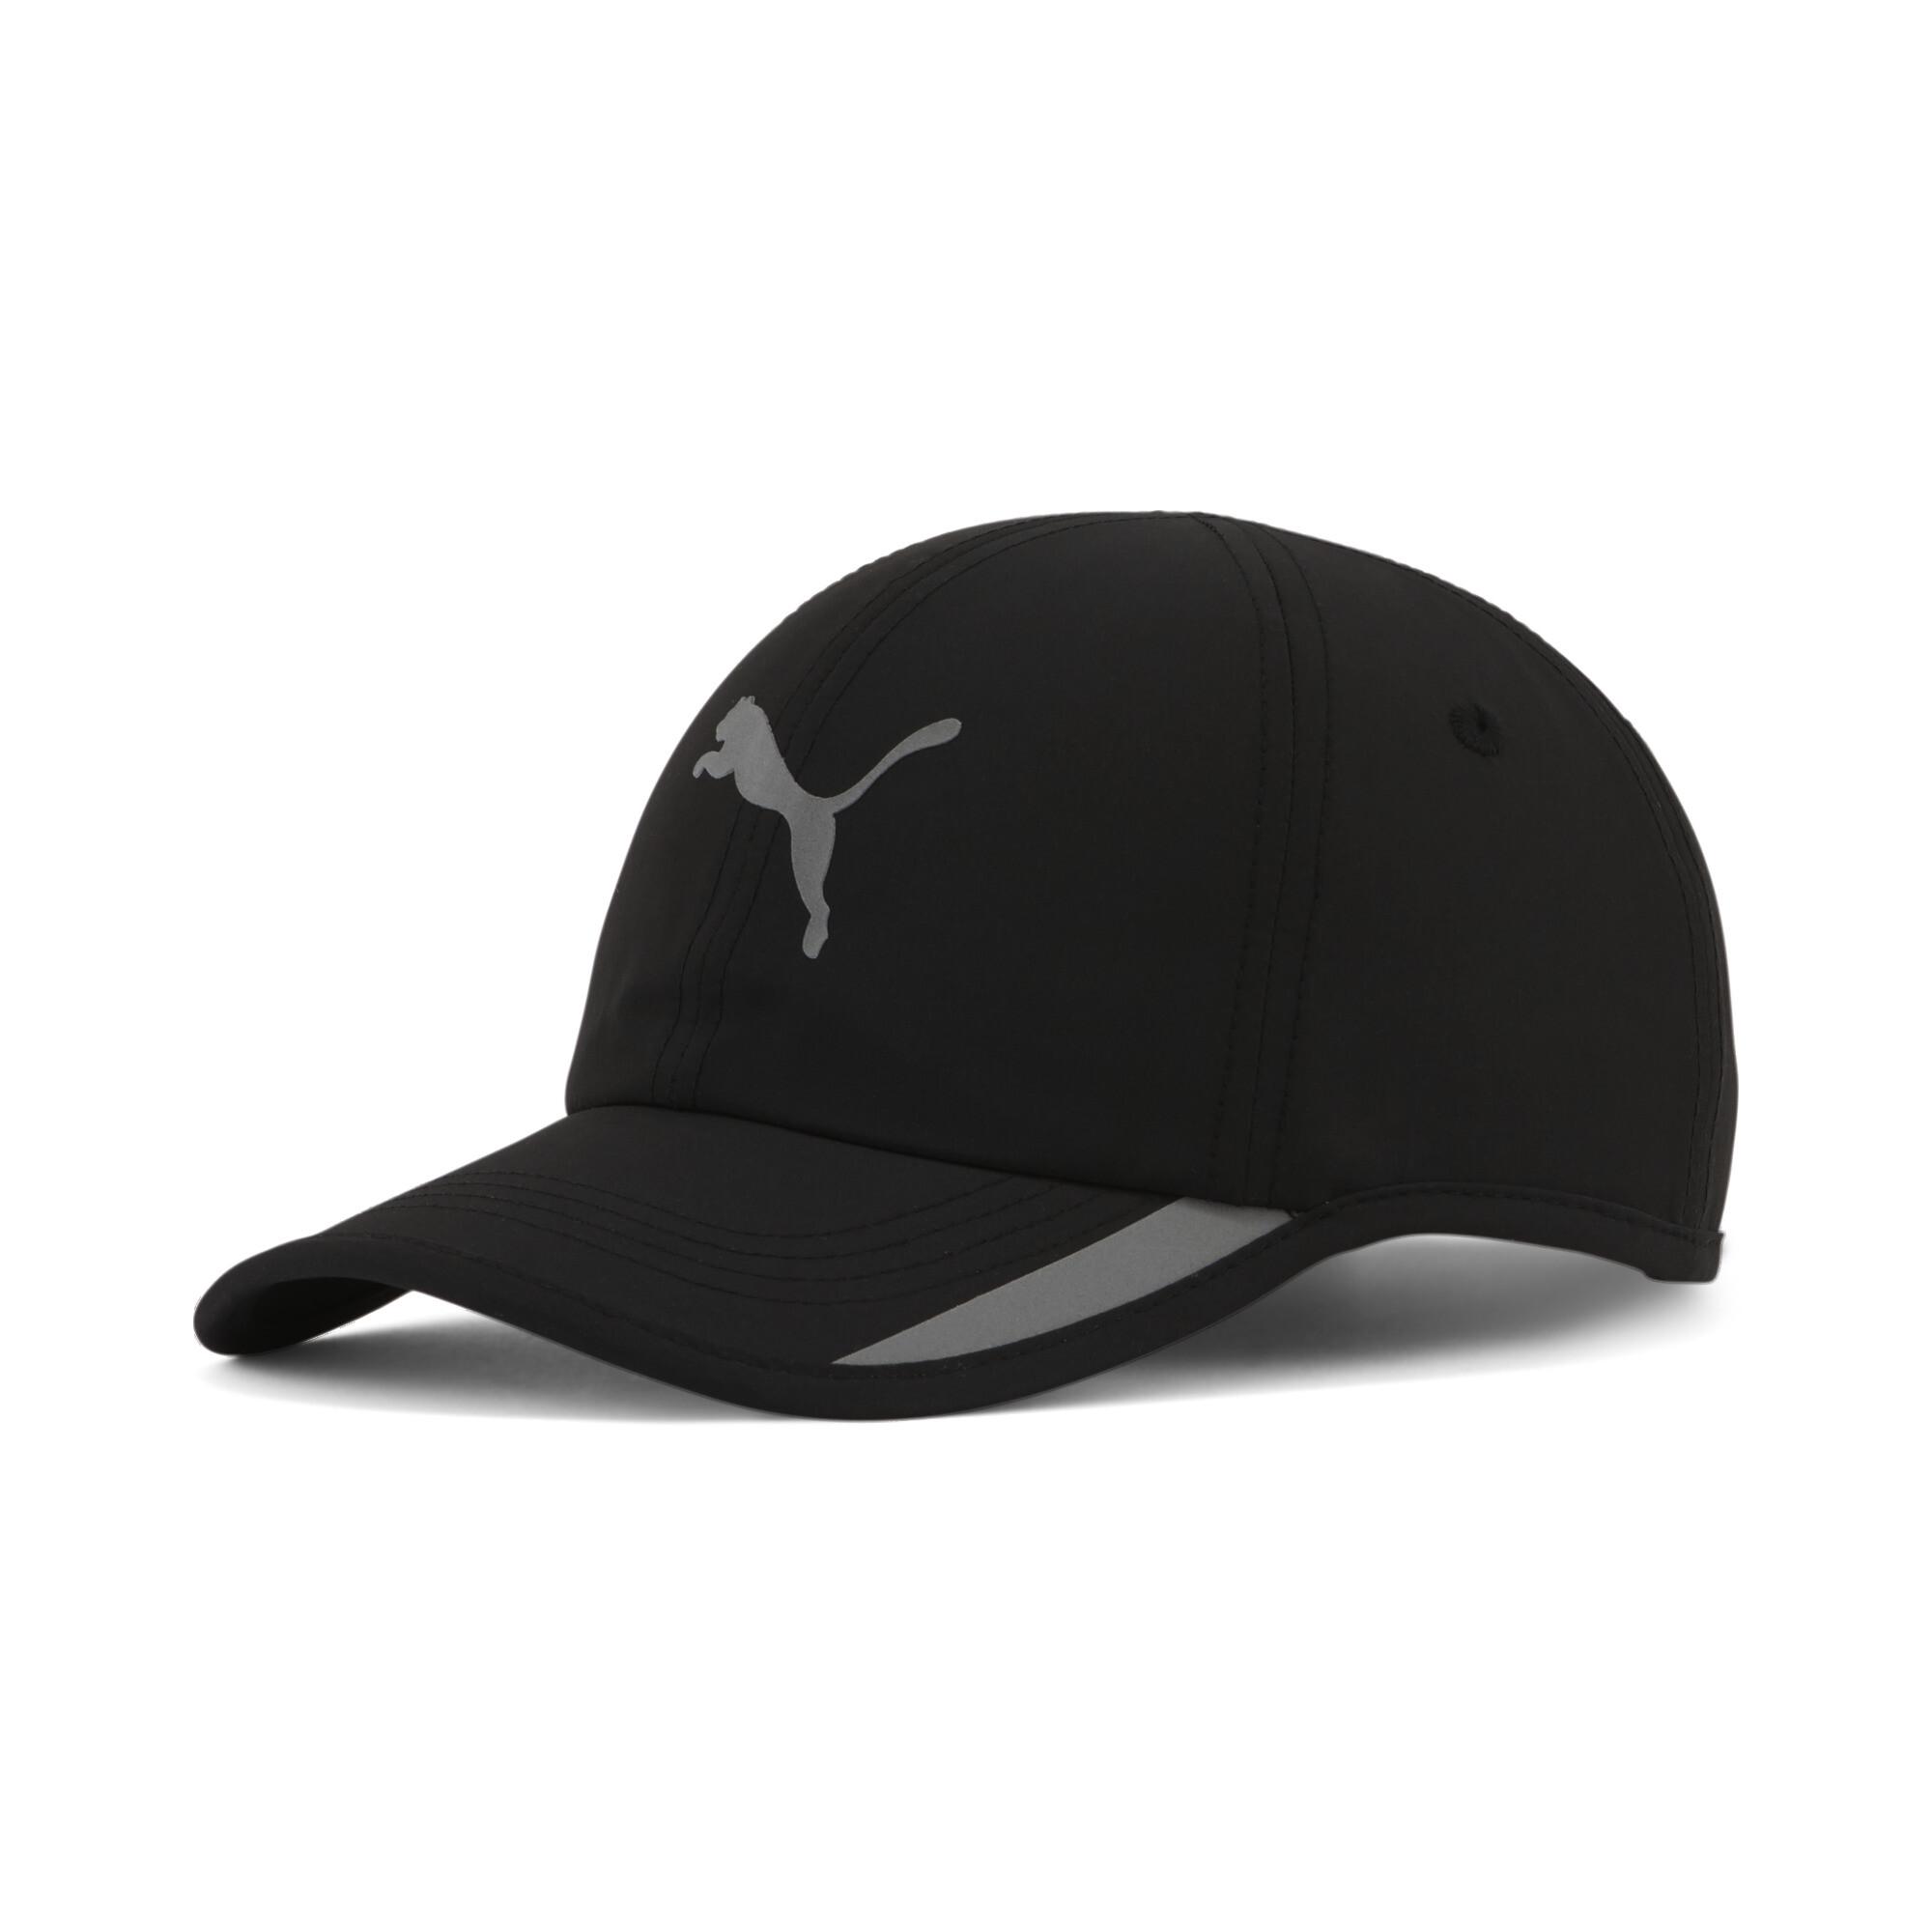 Puma Men's Flow Adjustable Running Cap